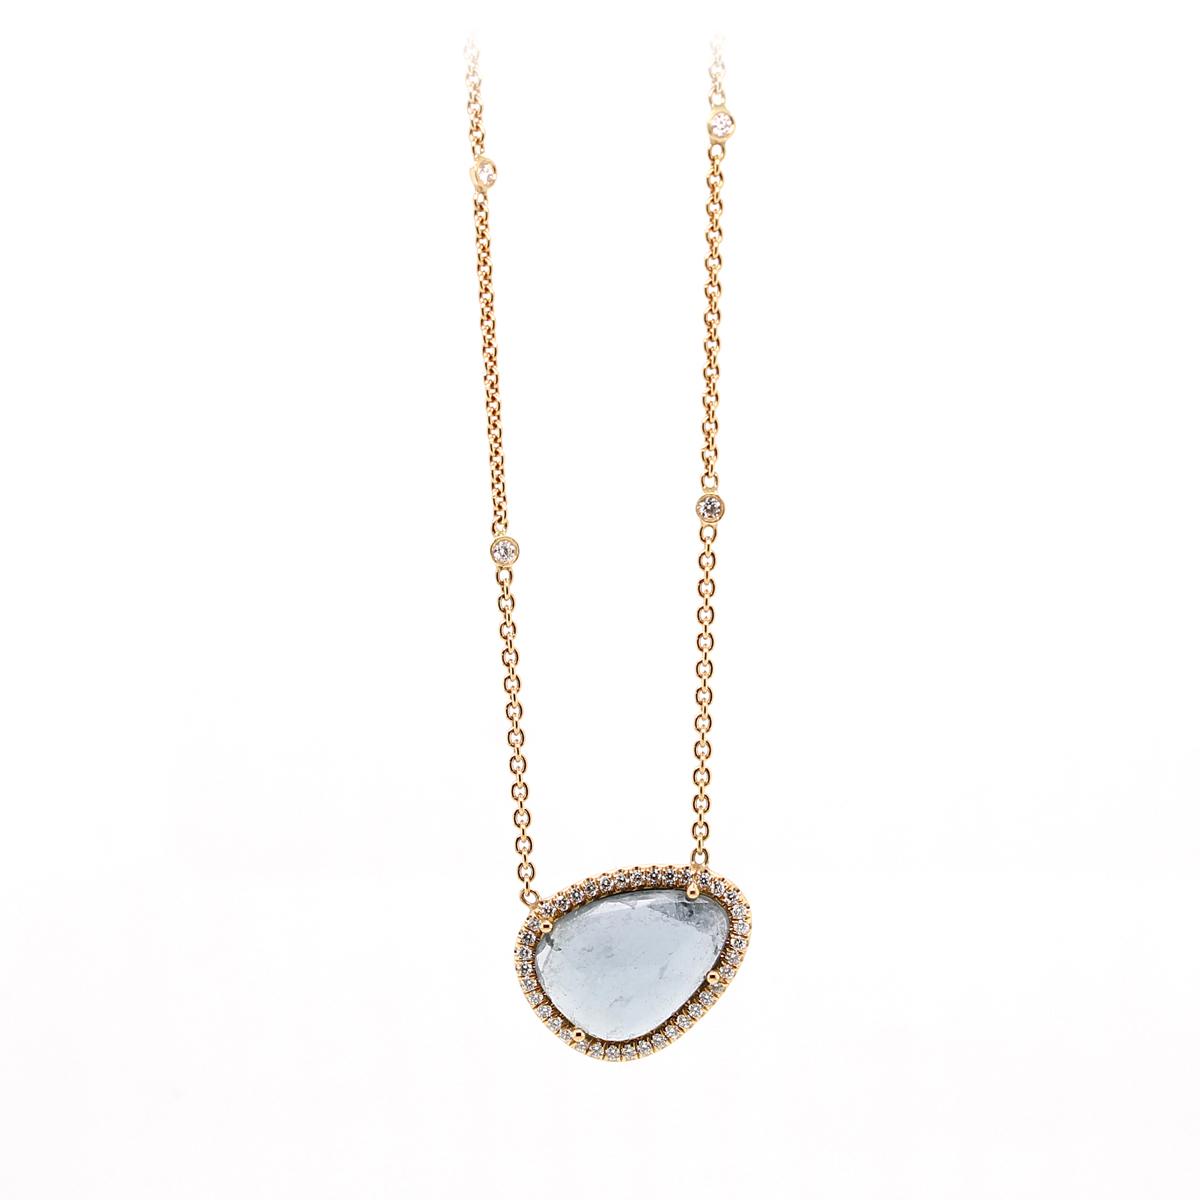 Lauren K 18 Karat Rose Gold Blue Topaz and Diamond Layla Necklace